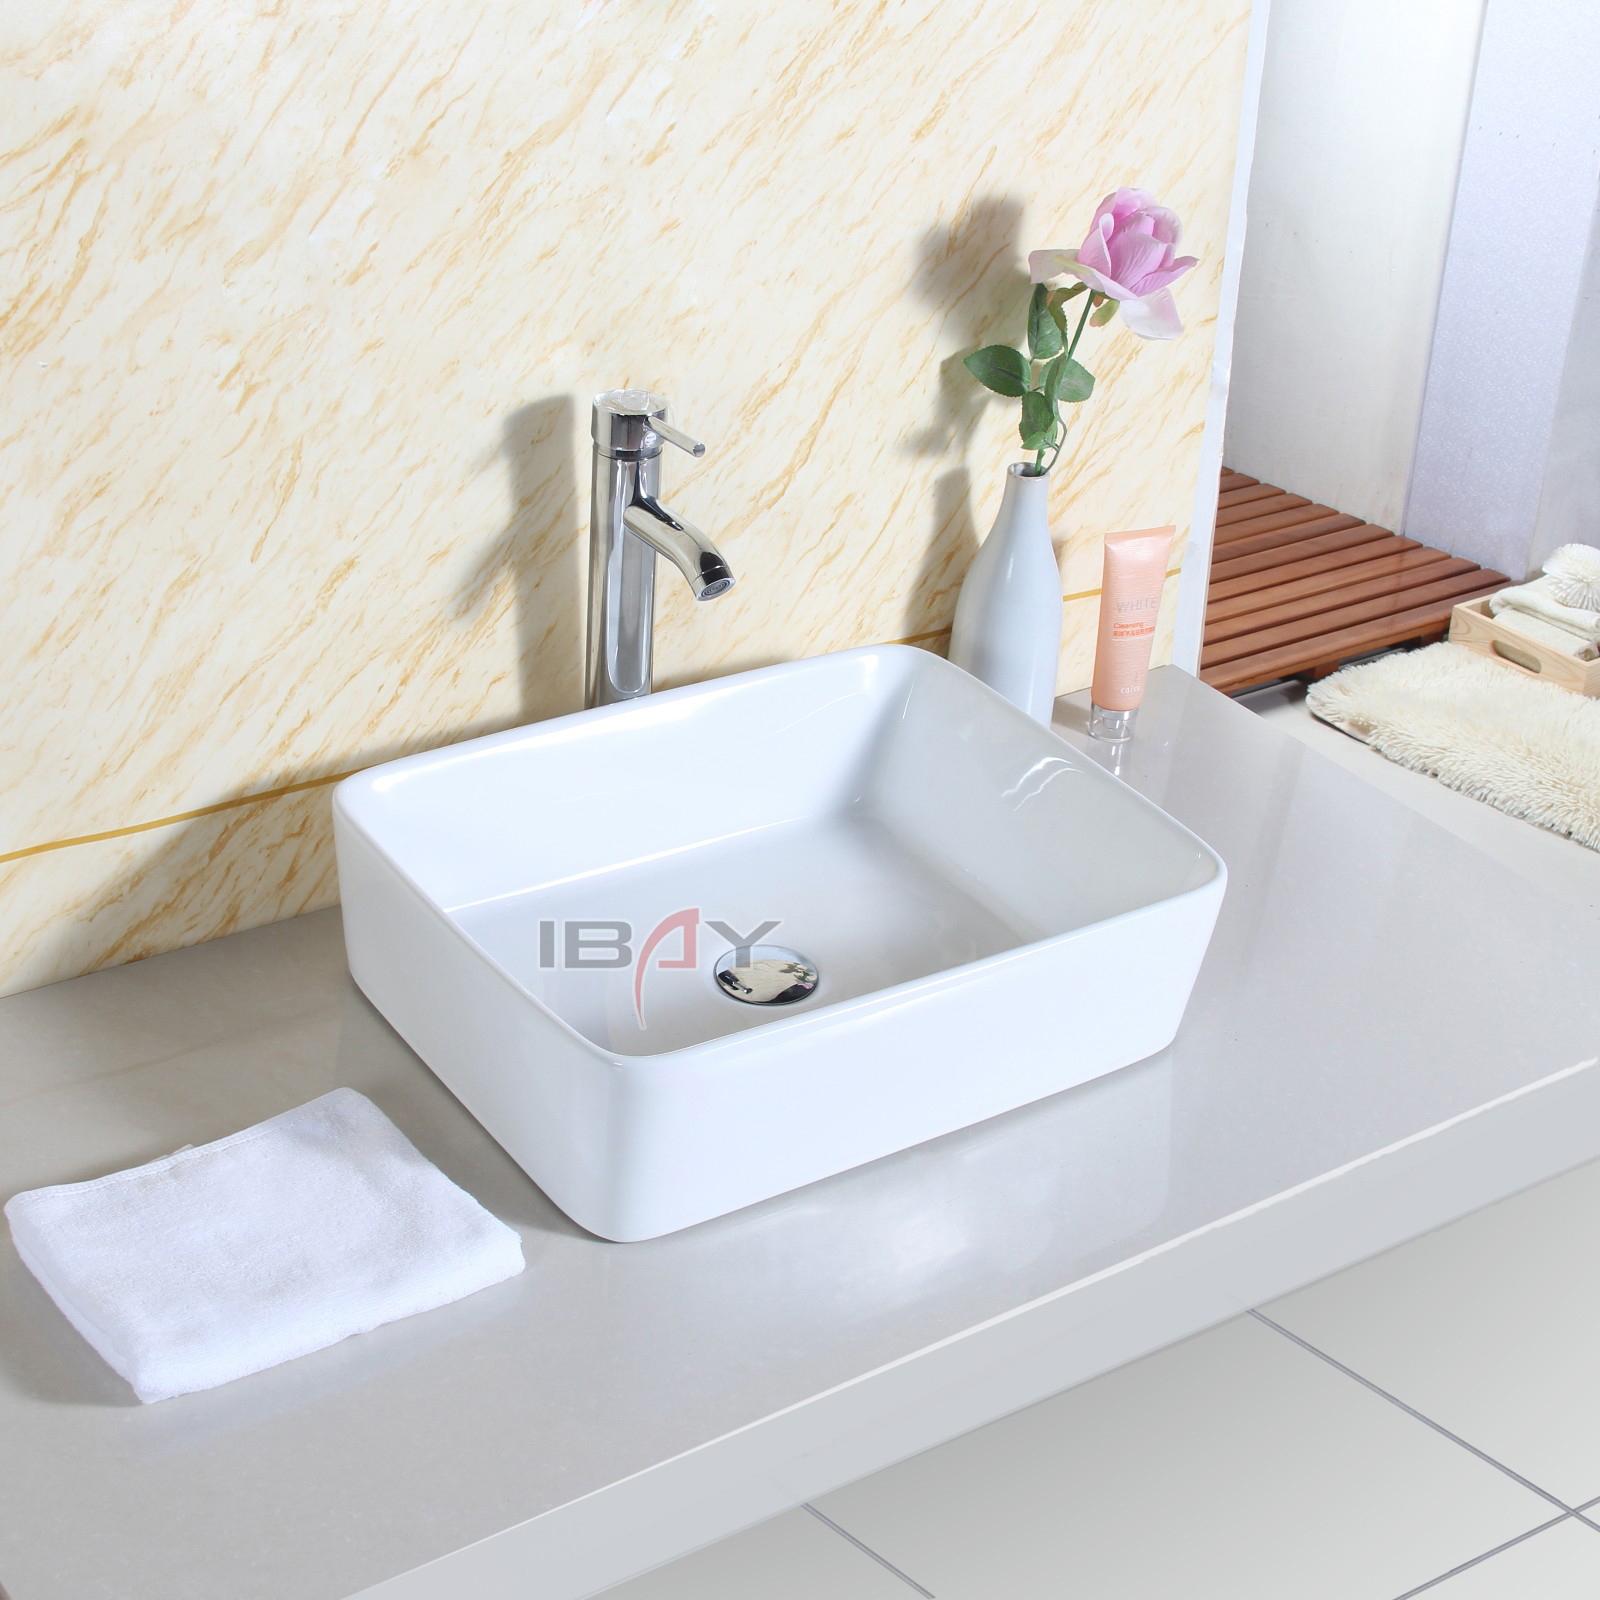 Basin Sink Countertop Square Bathroom Ceramic Wash Bowl